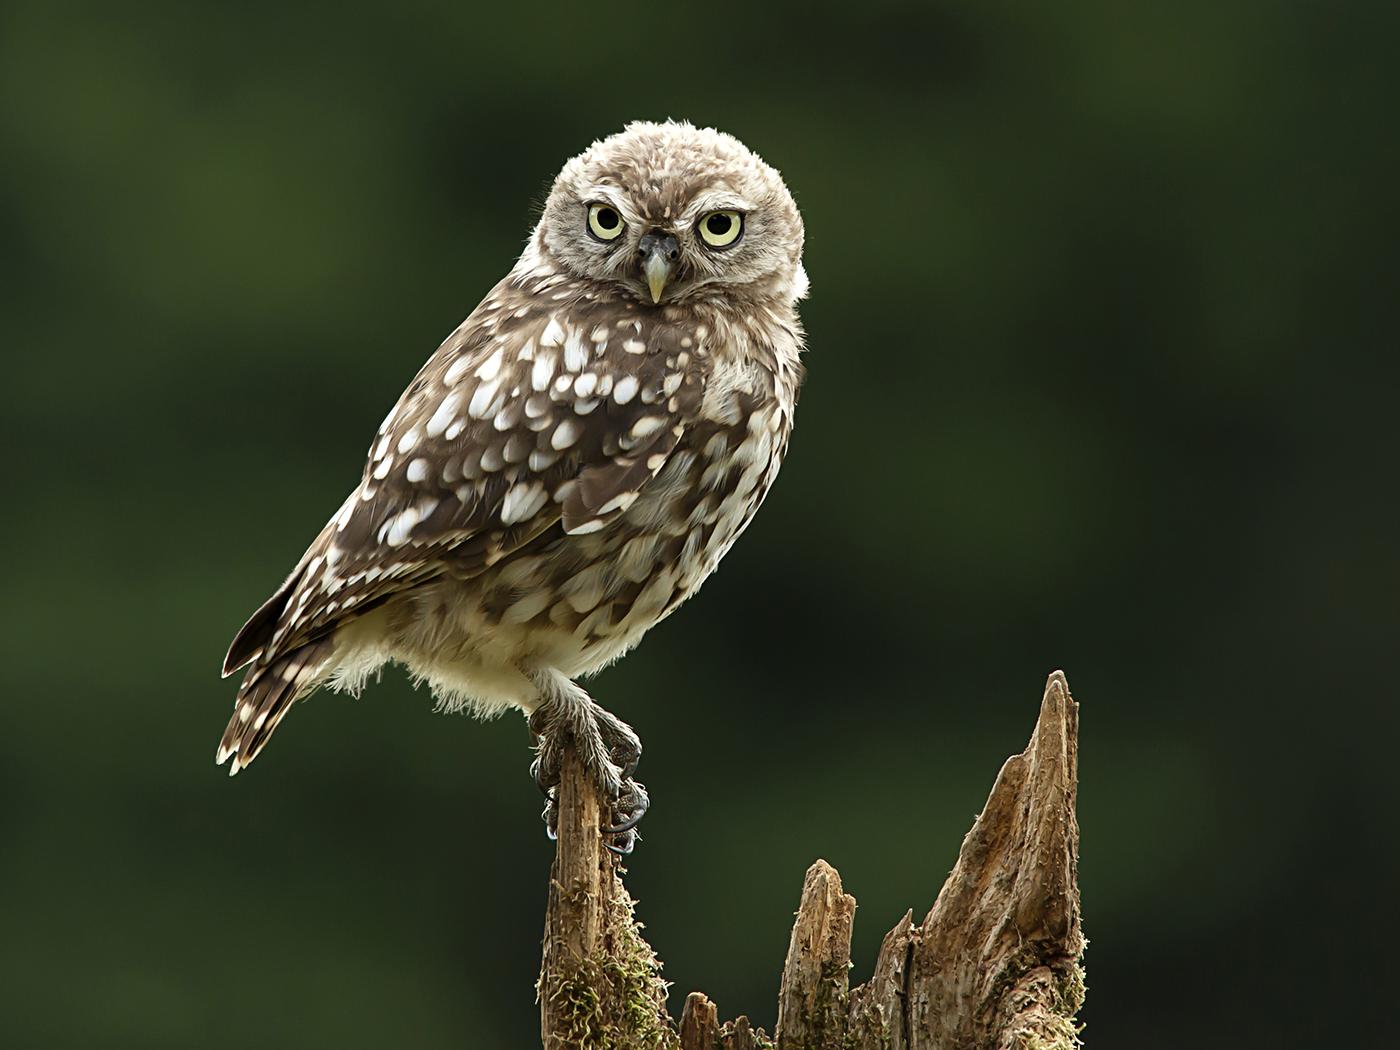 Juvenile Little Owl_Prashant-Meswani.jpg